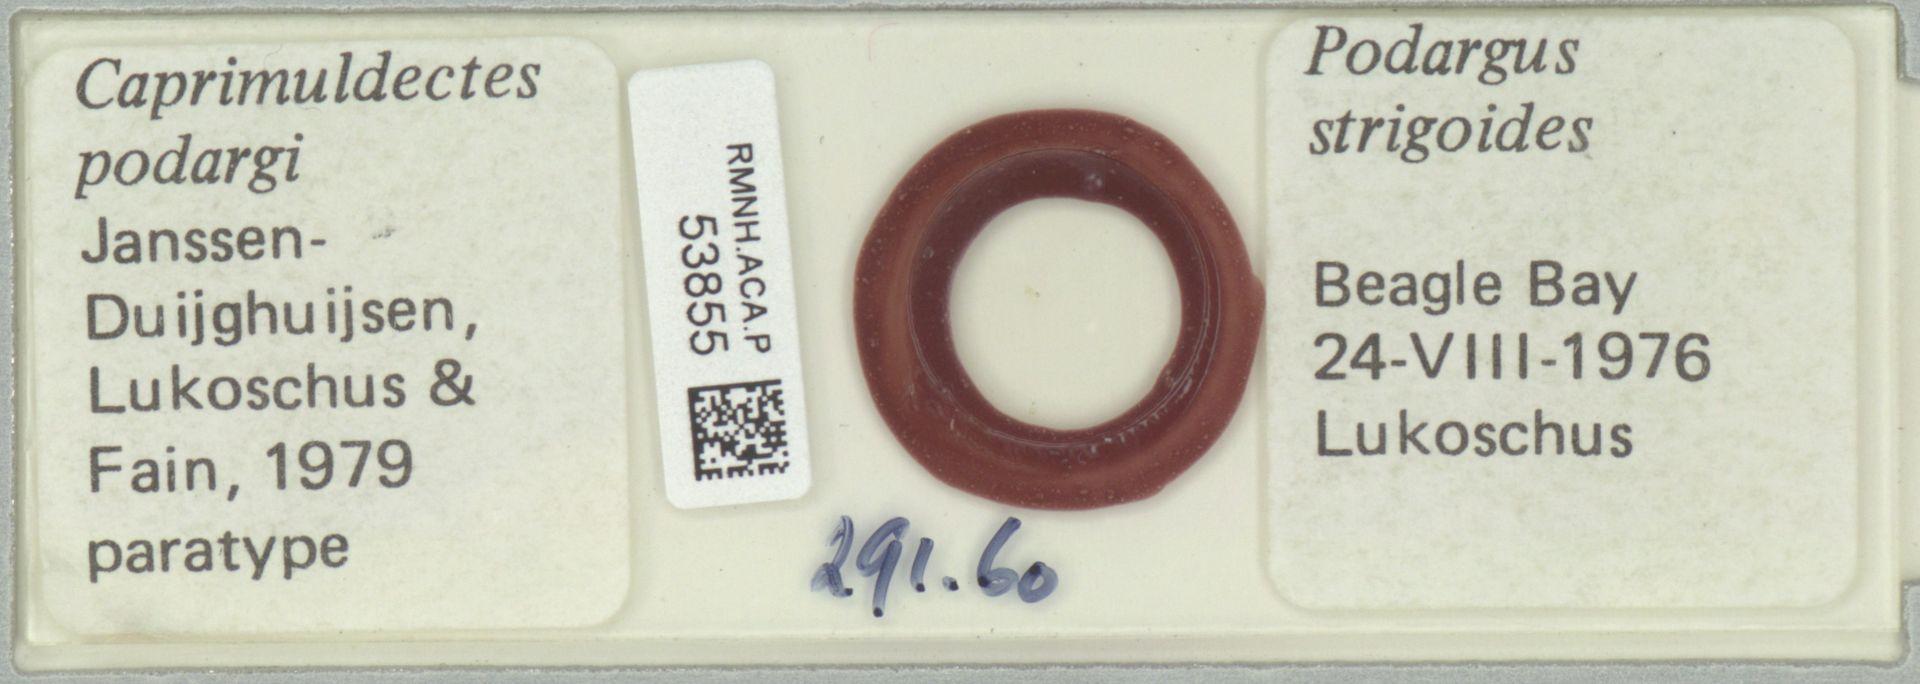 RMNH.ACA.P.53855 | Caprimuldectes podargi Janssen-Duijghuijsen, Lukoschus & Fain, 1979